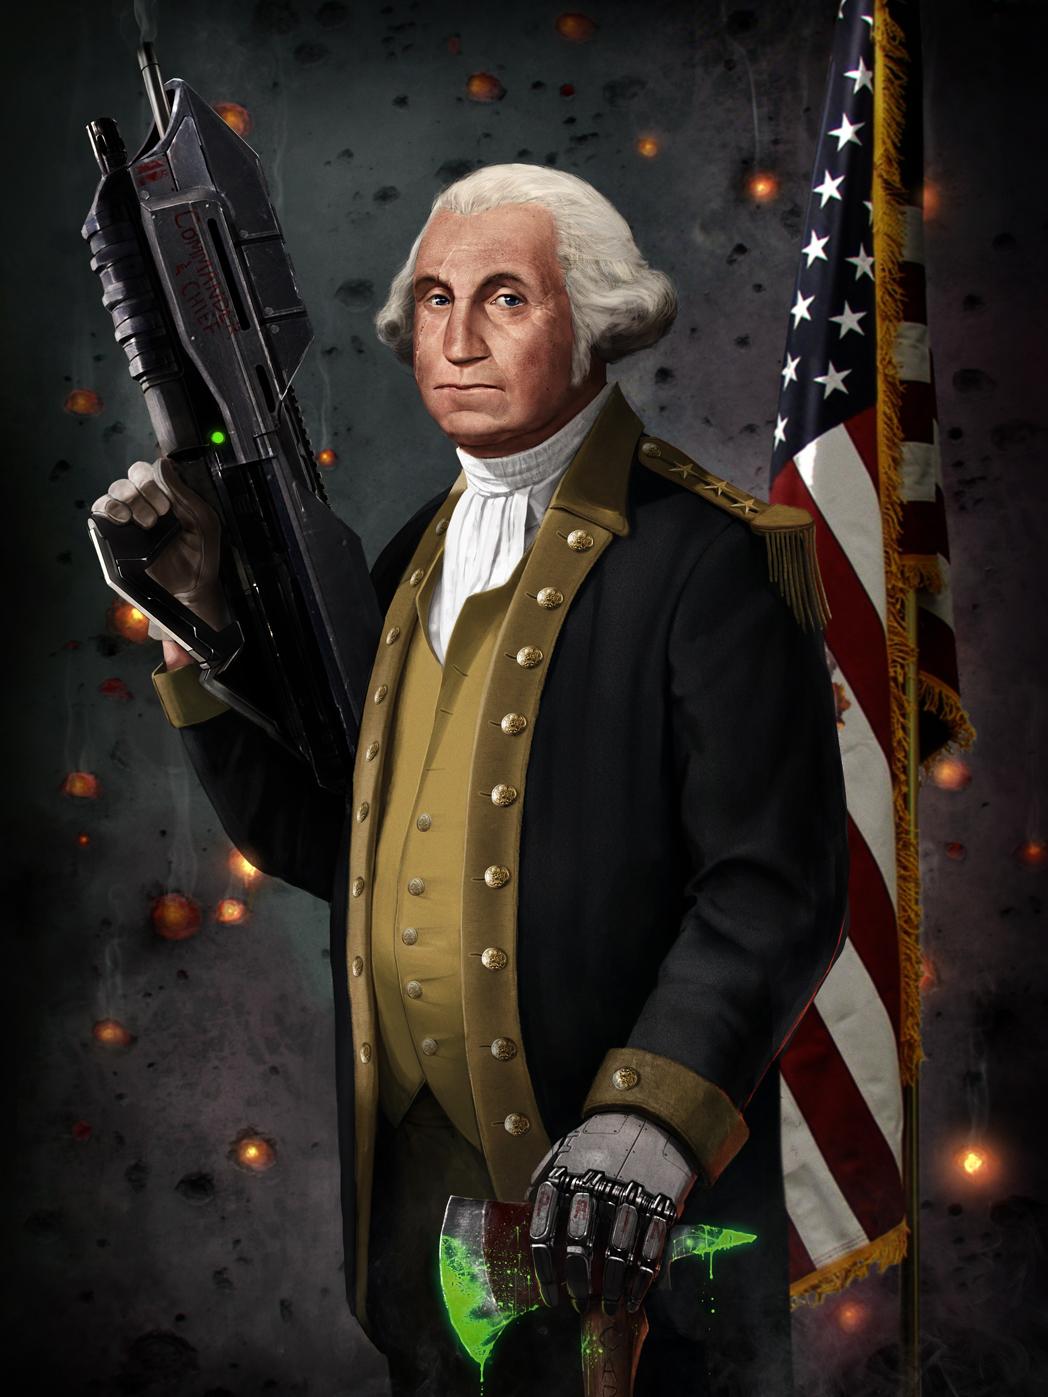 George Washington The Original Master Chief by SharpWriter